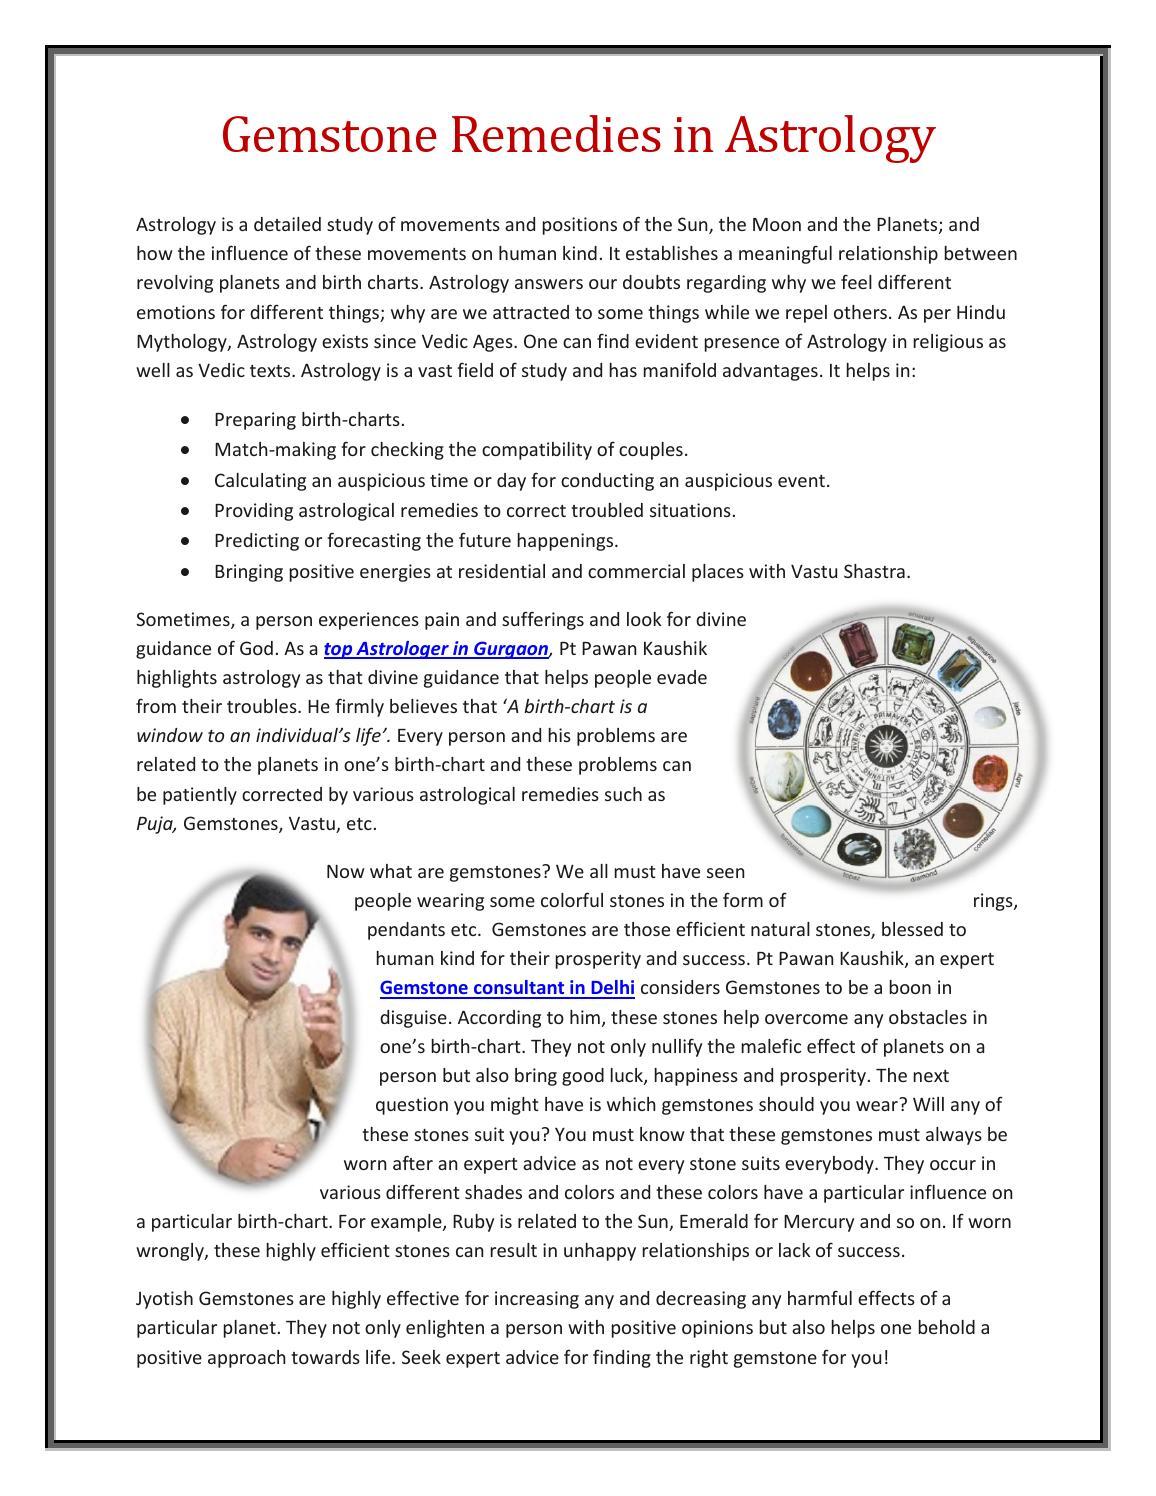 Gemstone Remedies In Astrology Pt Pawan Kaushik By Sumit Sharma